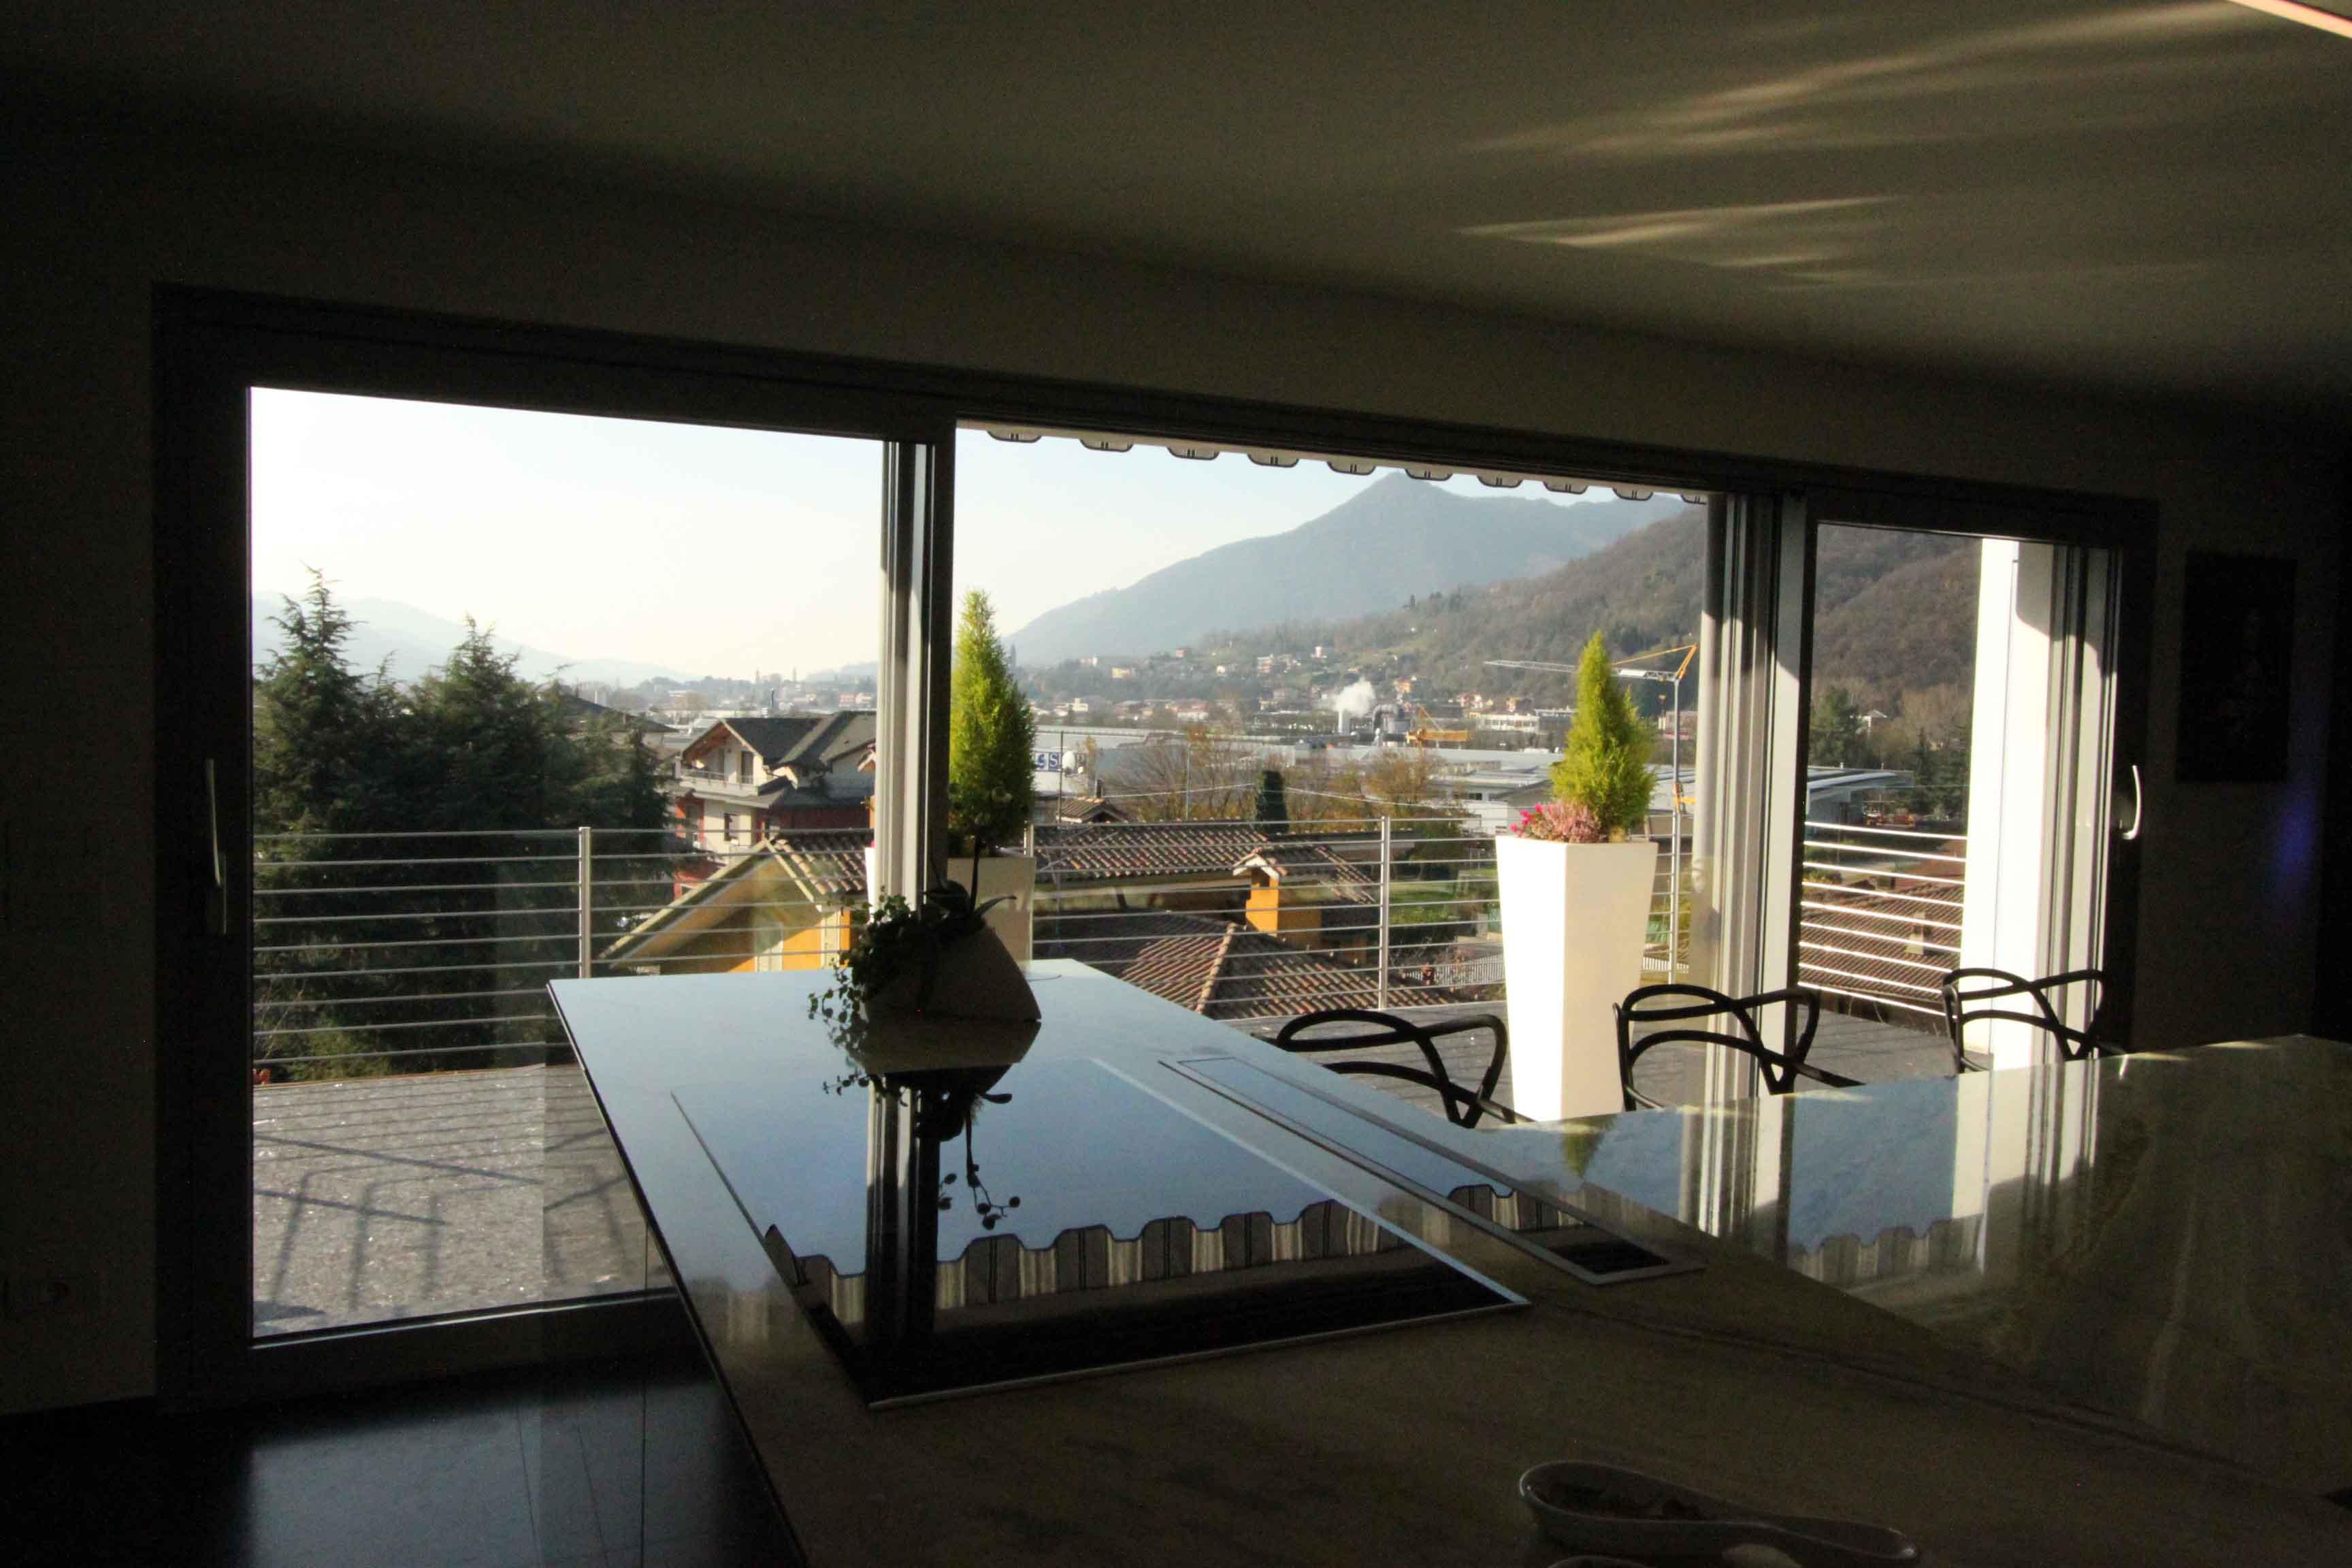 studio_balini_architettura_bergamo 6